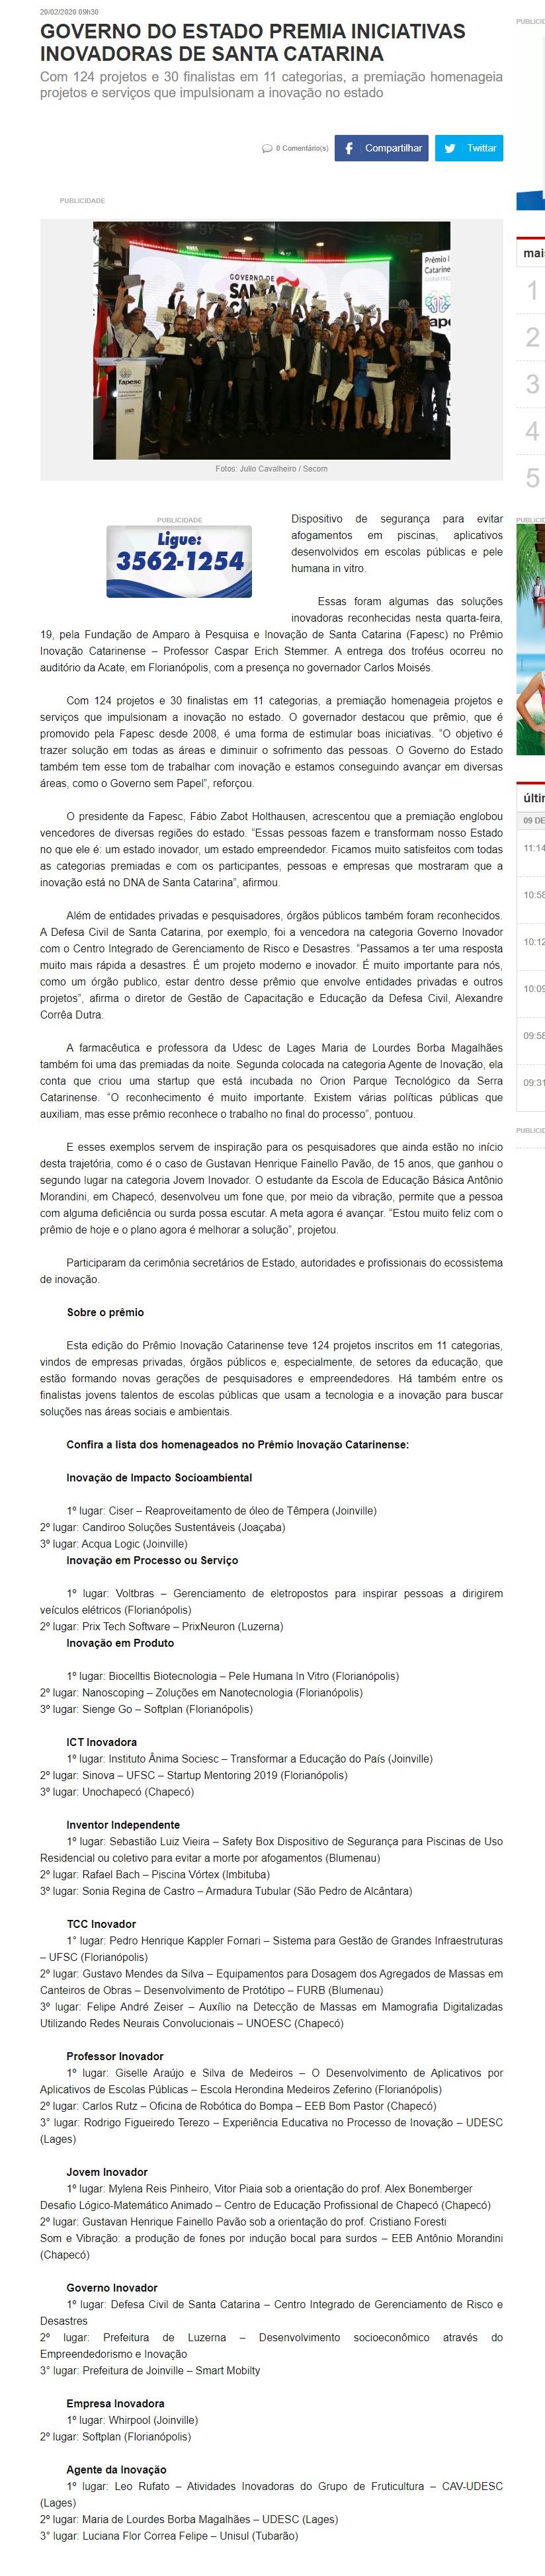 GOVERNO DO ESTADO PREMIA INICIATIVAS INOVADORAS DE SANTA CATARINA - Educadora